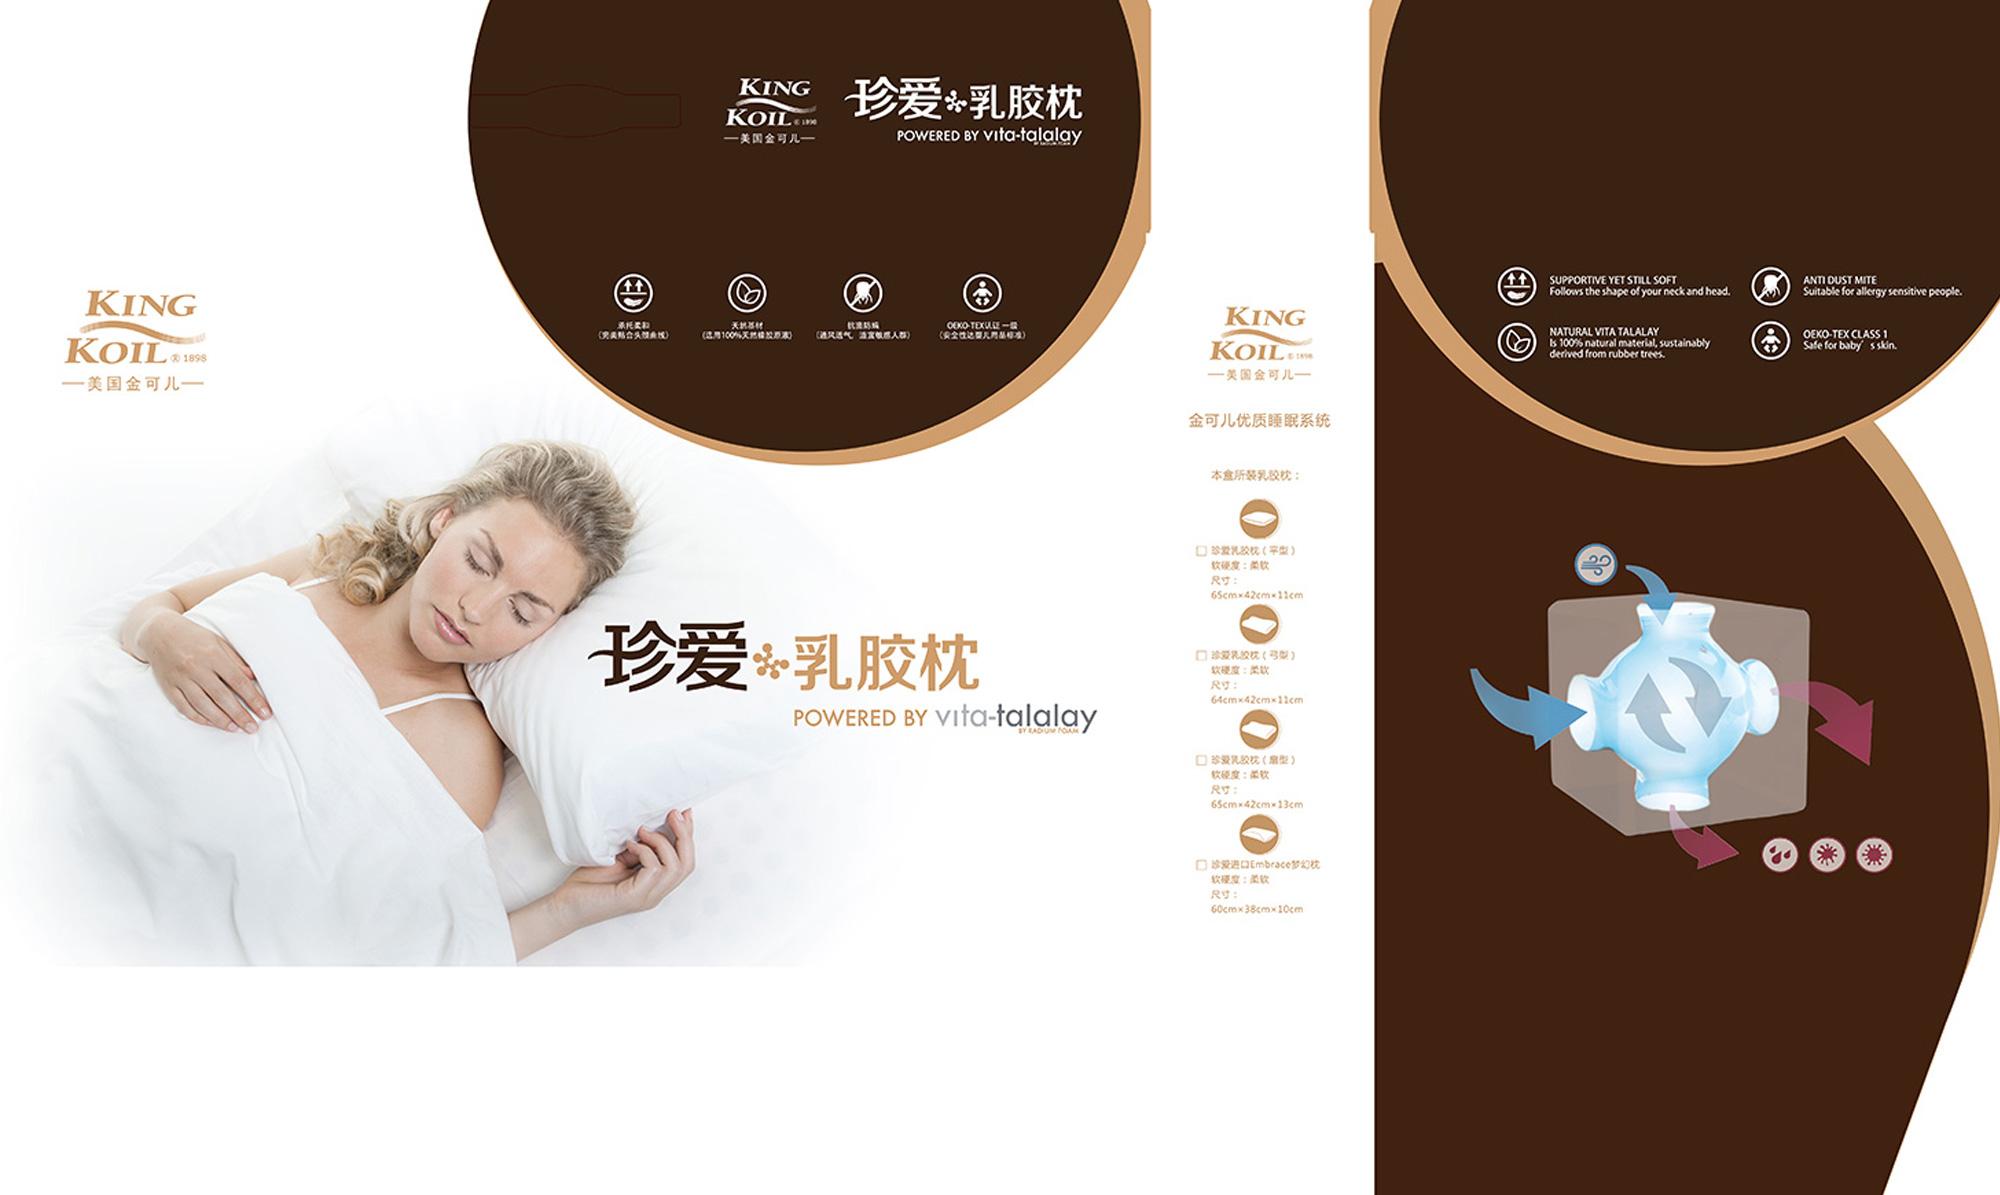 quentin_paquignon-packaging-kingkoilchina_07.jpg